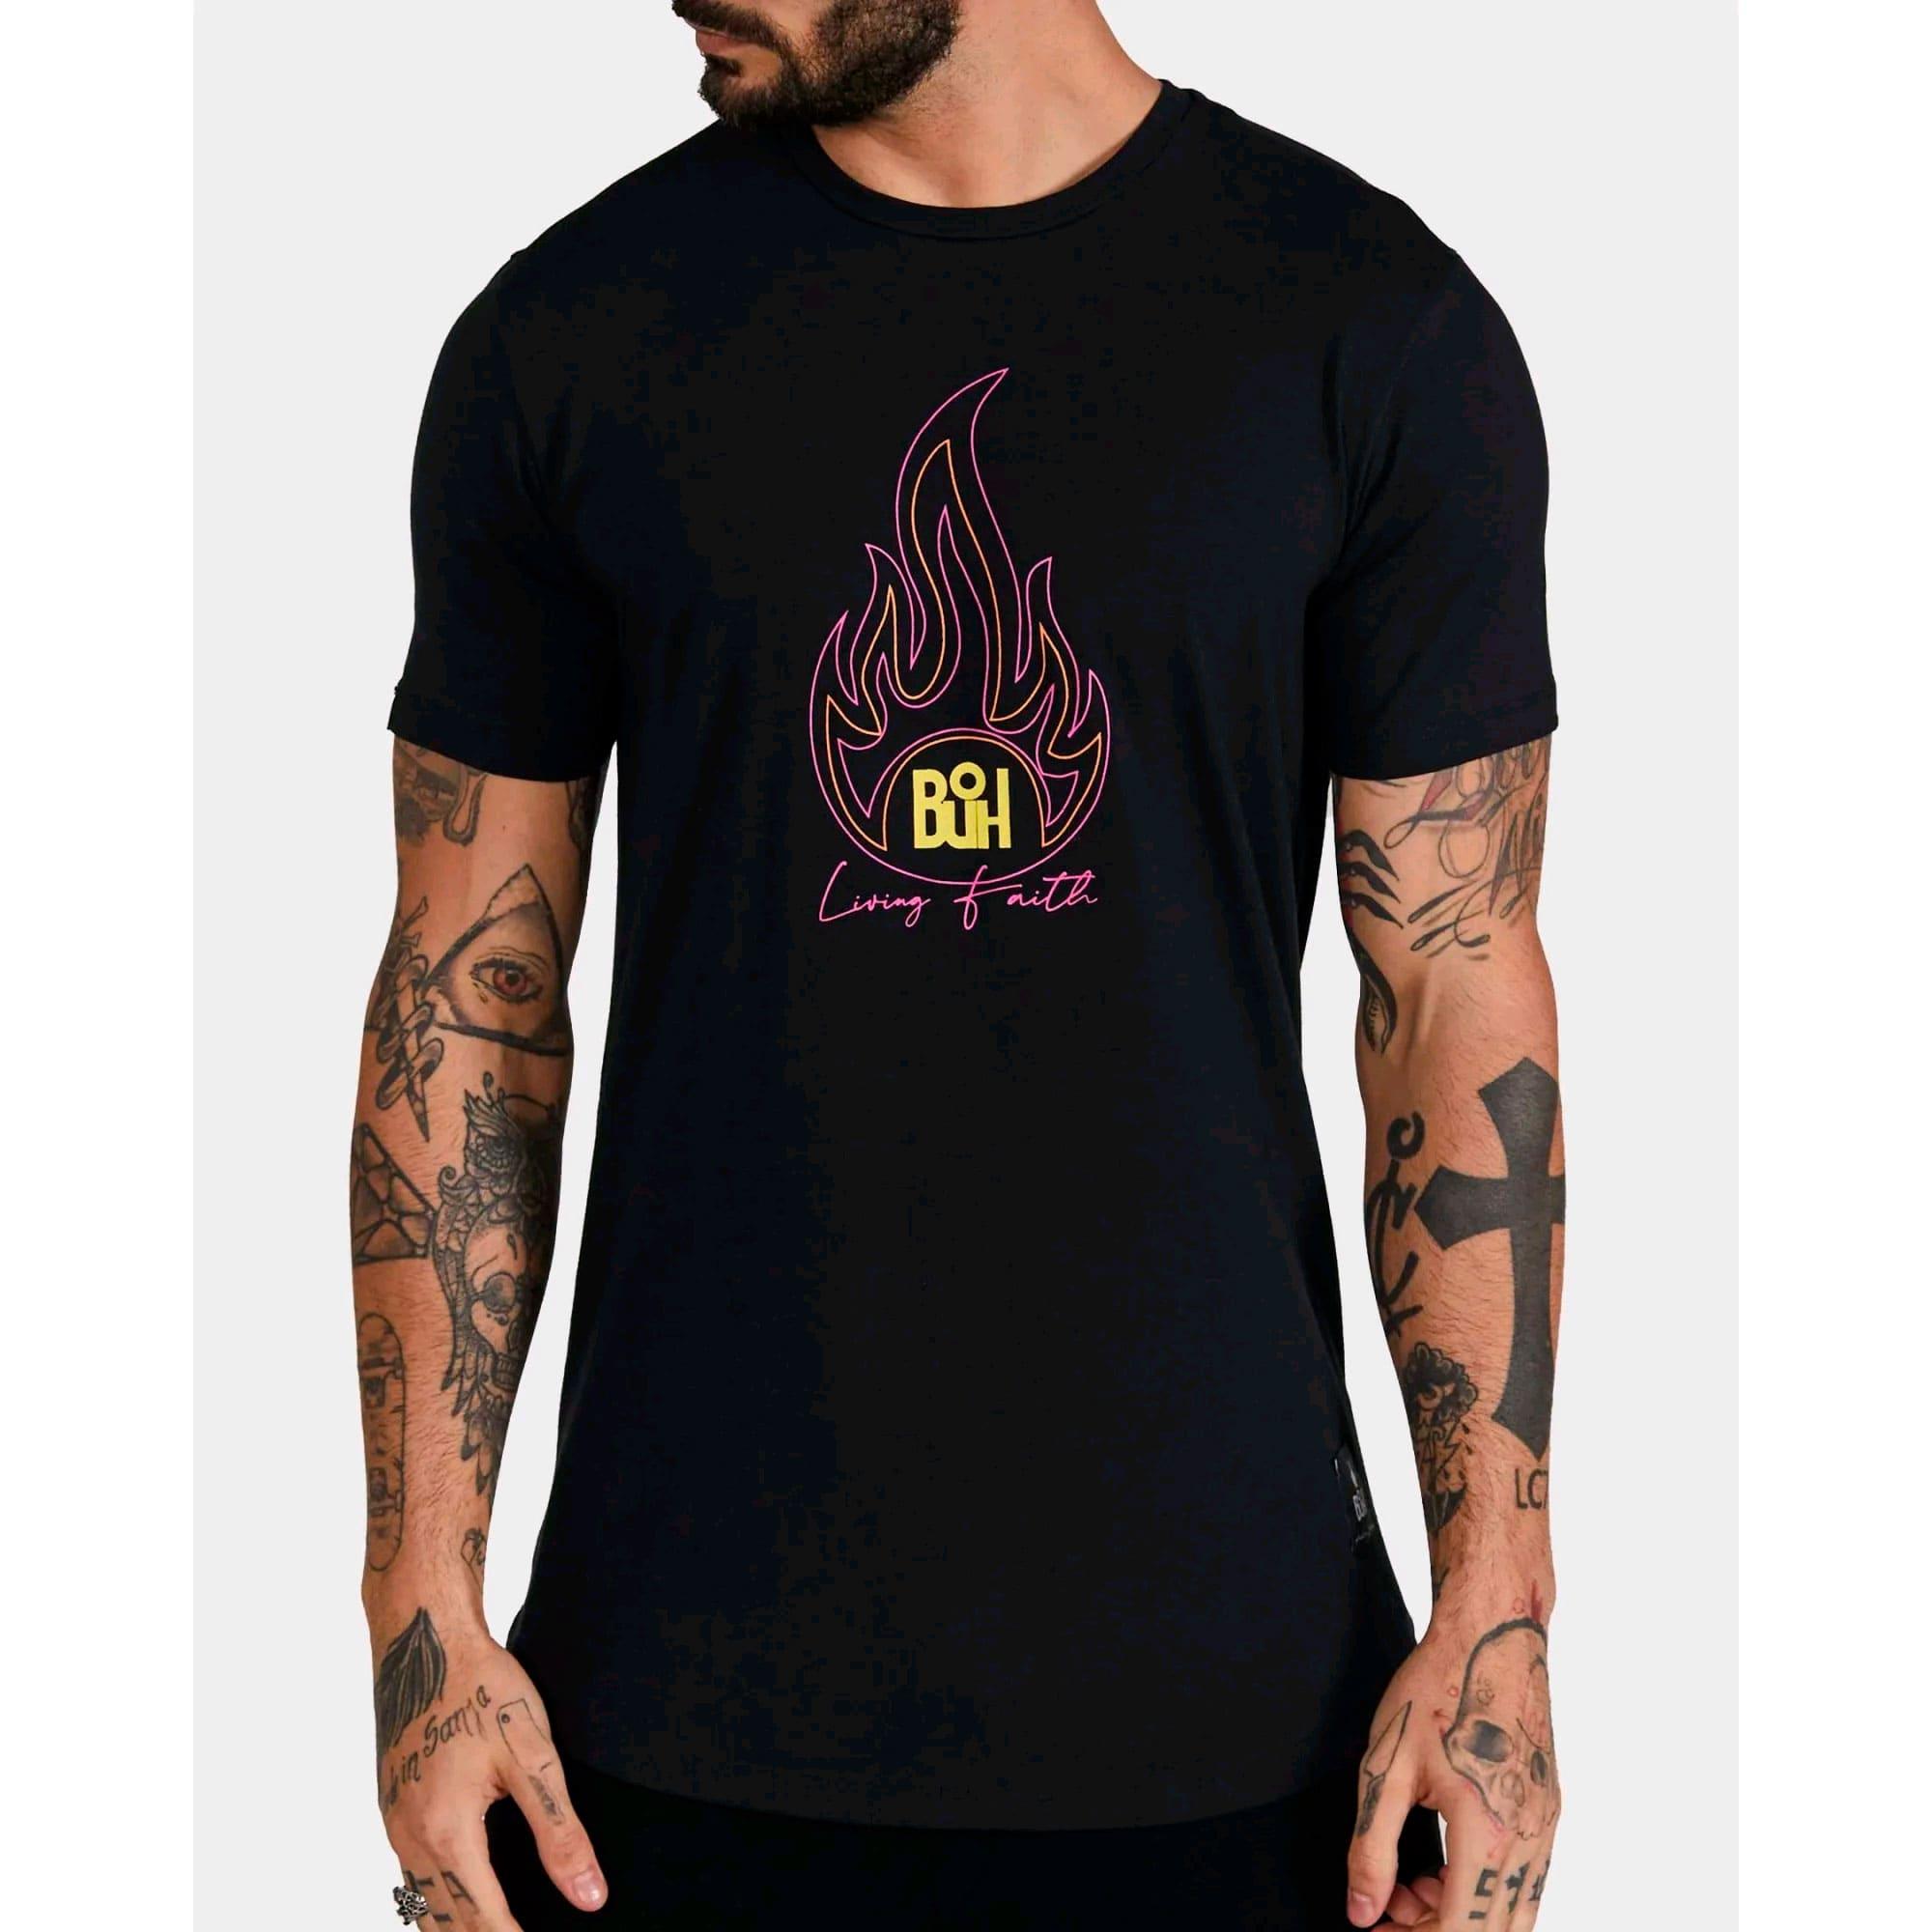 Camiseta Buh Living Faith Black